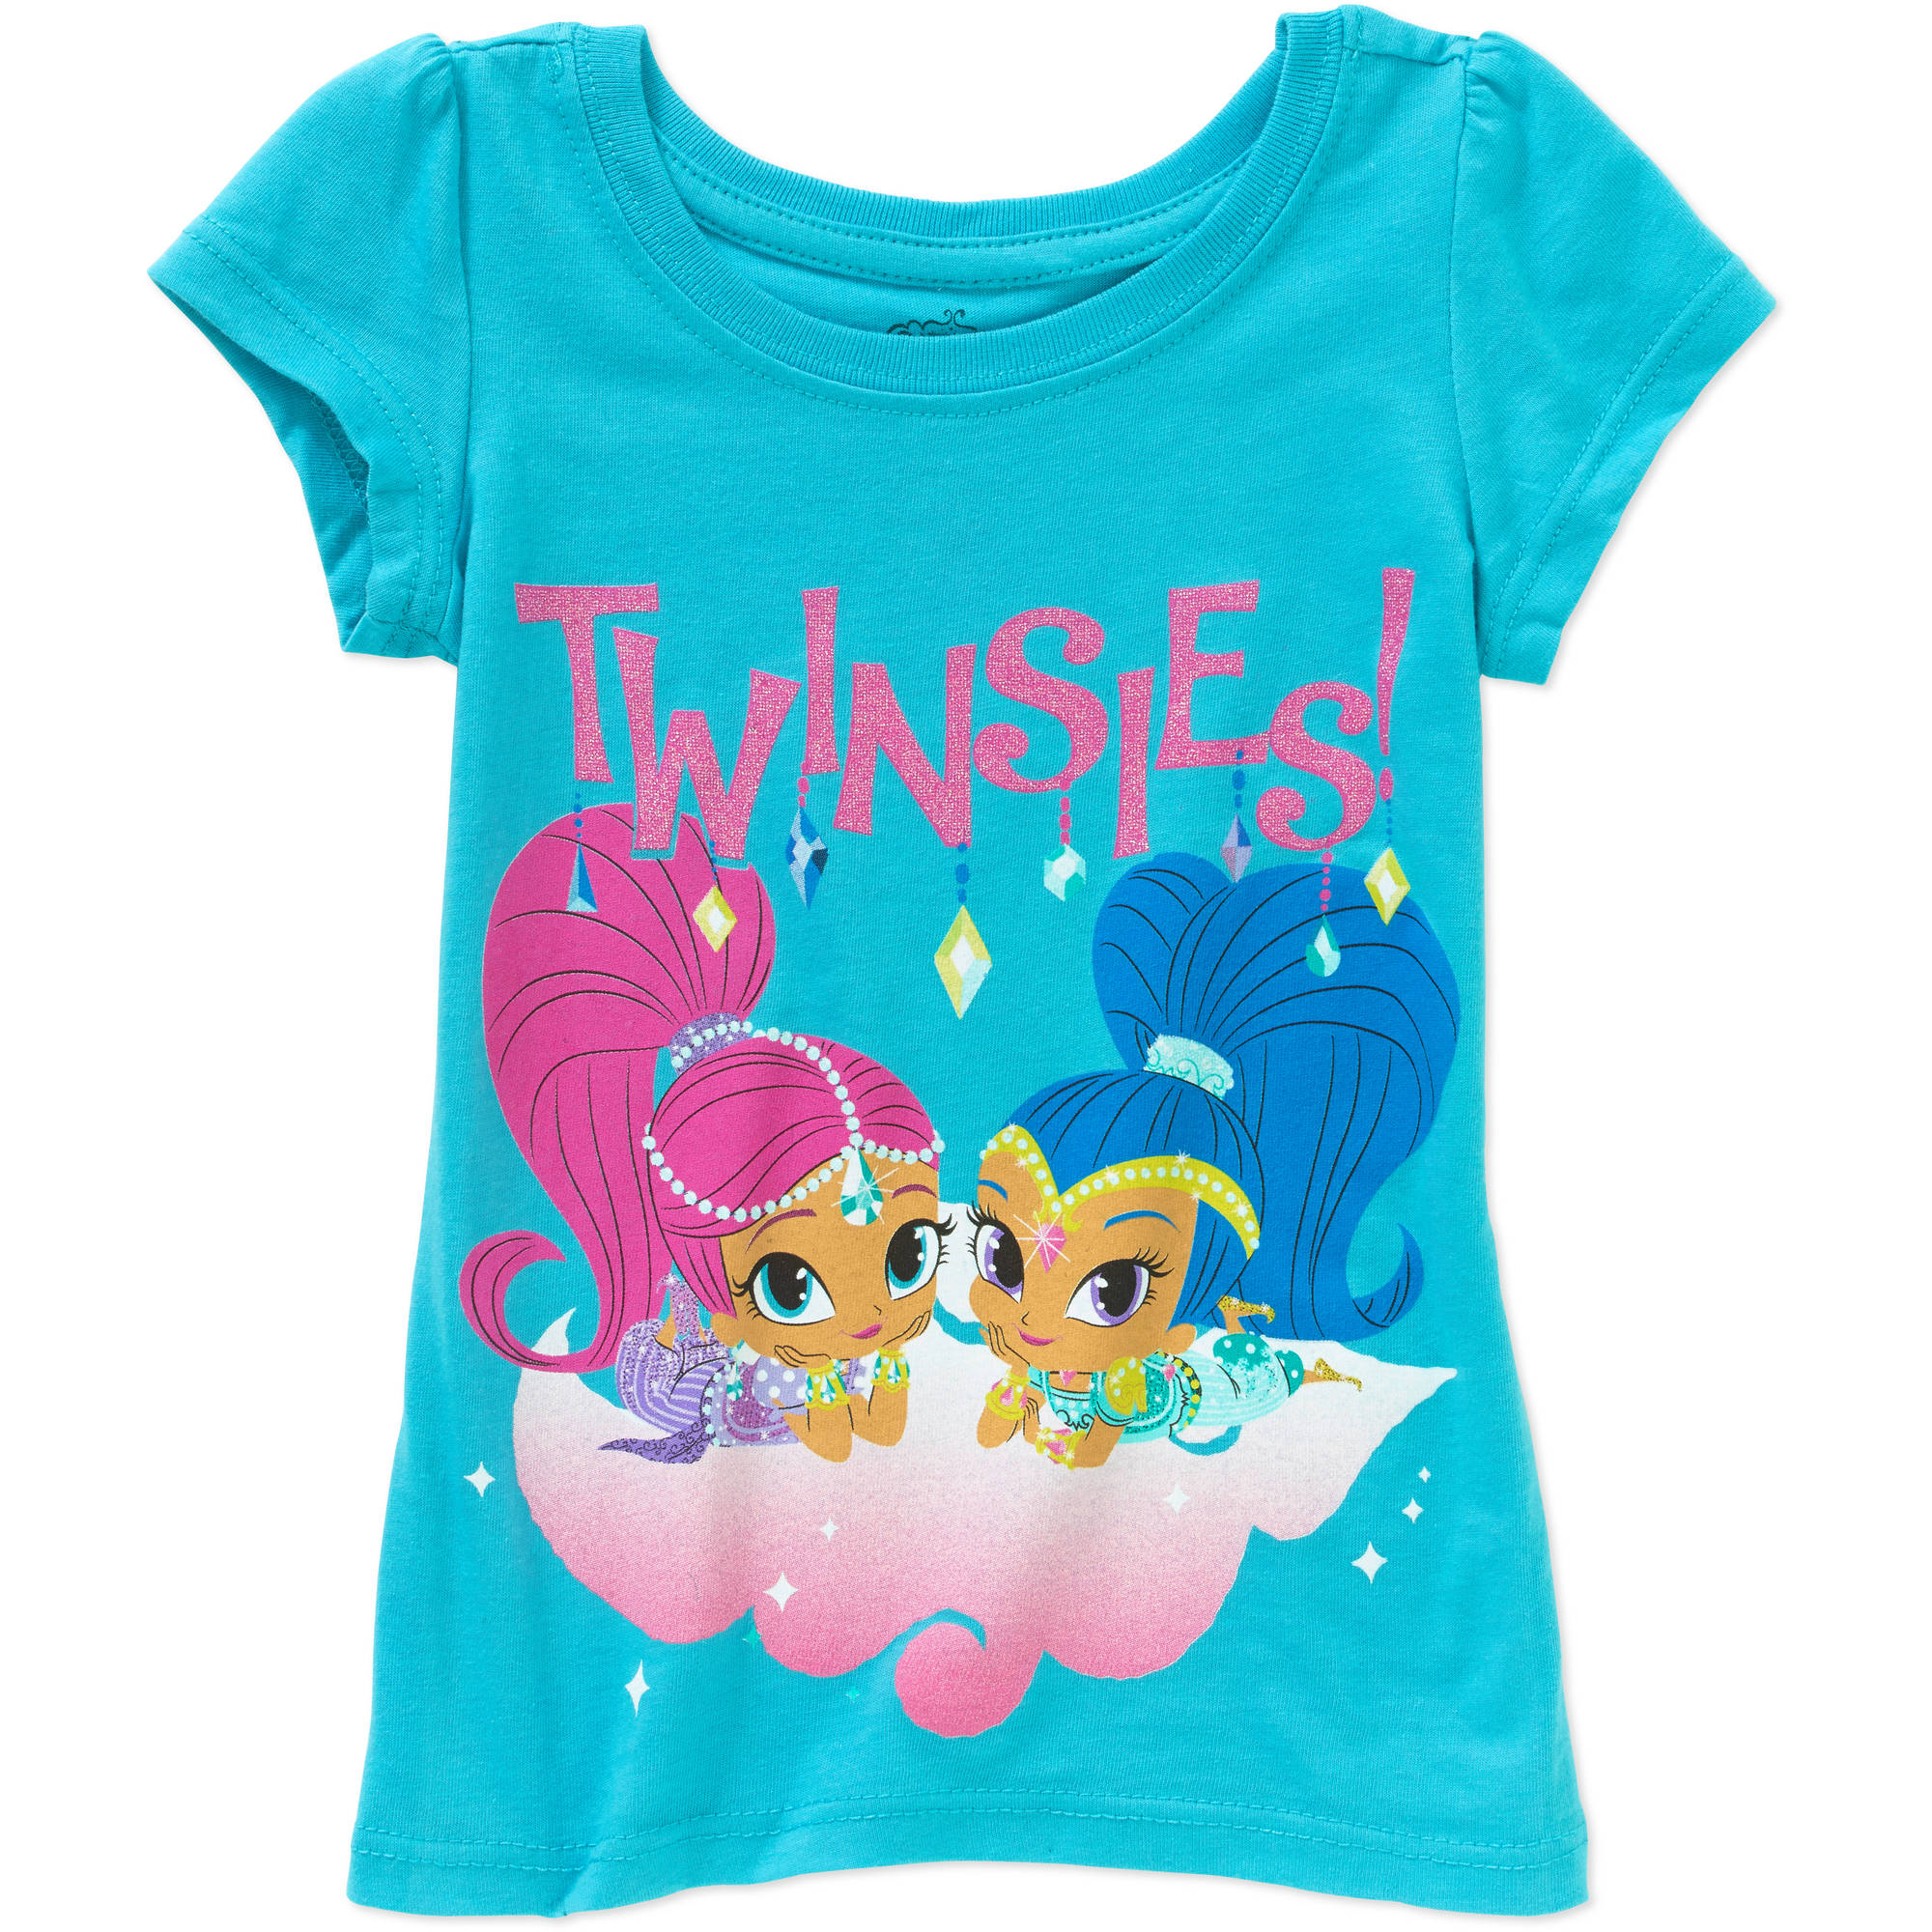 "Nickelodeon Shimmer & Shine ""Twinsies"" Toddler Girls Short Sleeve Graphic Tee"